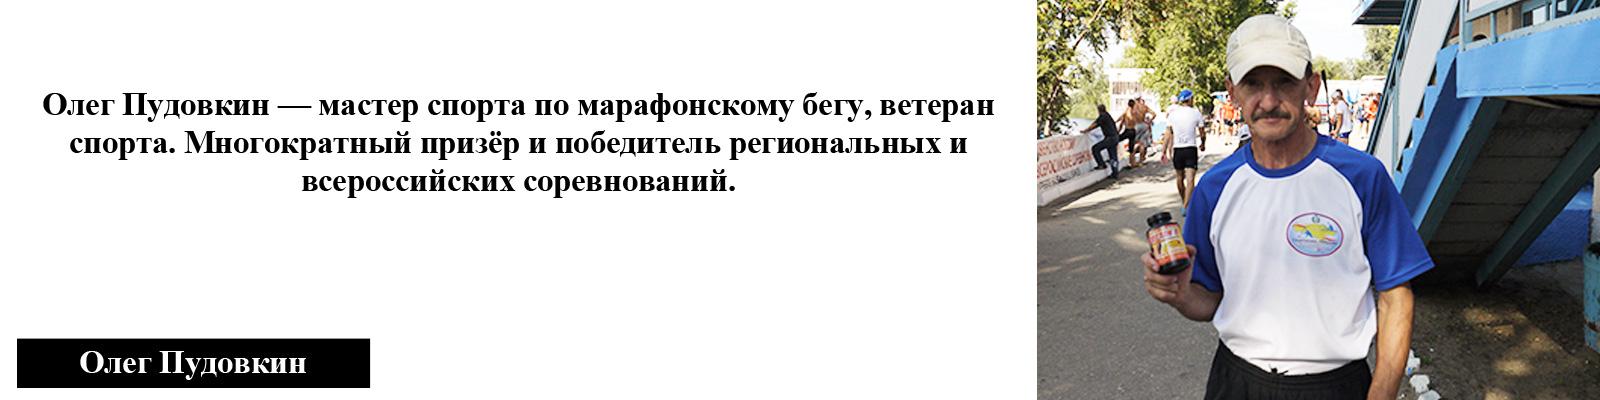 Пудовкин - легкая атлетика